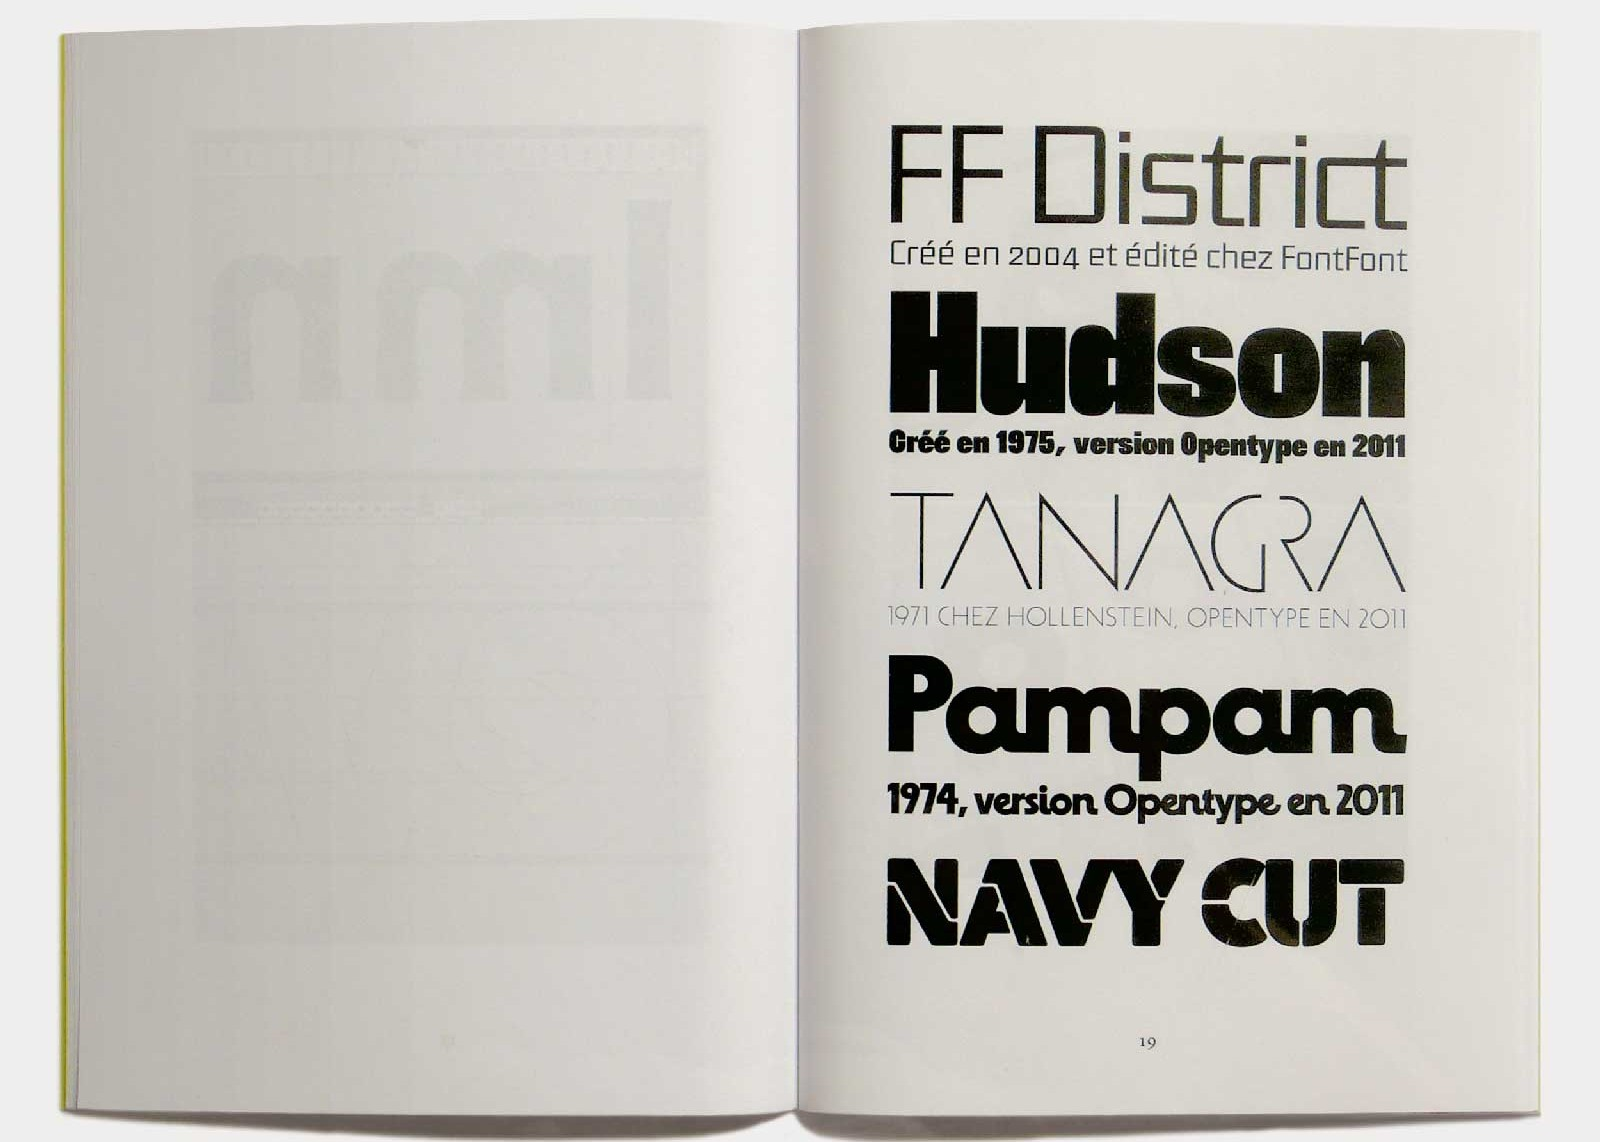 Page 19 — Caractères District (2004, FontFont), Hudson (1975; 2011, version OpenType), Tanagra (1971, Hollenstein; 2011, version OpenType), Pampam (1974, Hollenstein; 2011, version OpenType), Navy Cut (1971, Hollenstein; 1986, Mecanorma; 2011, version OpenType).